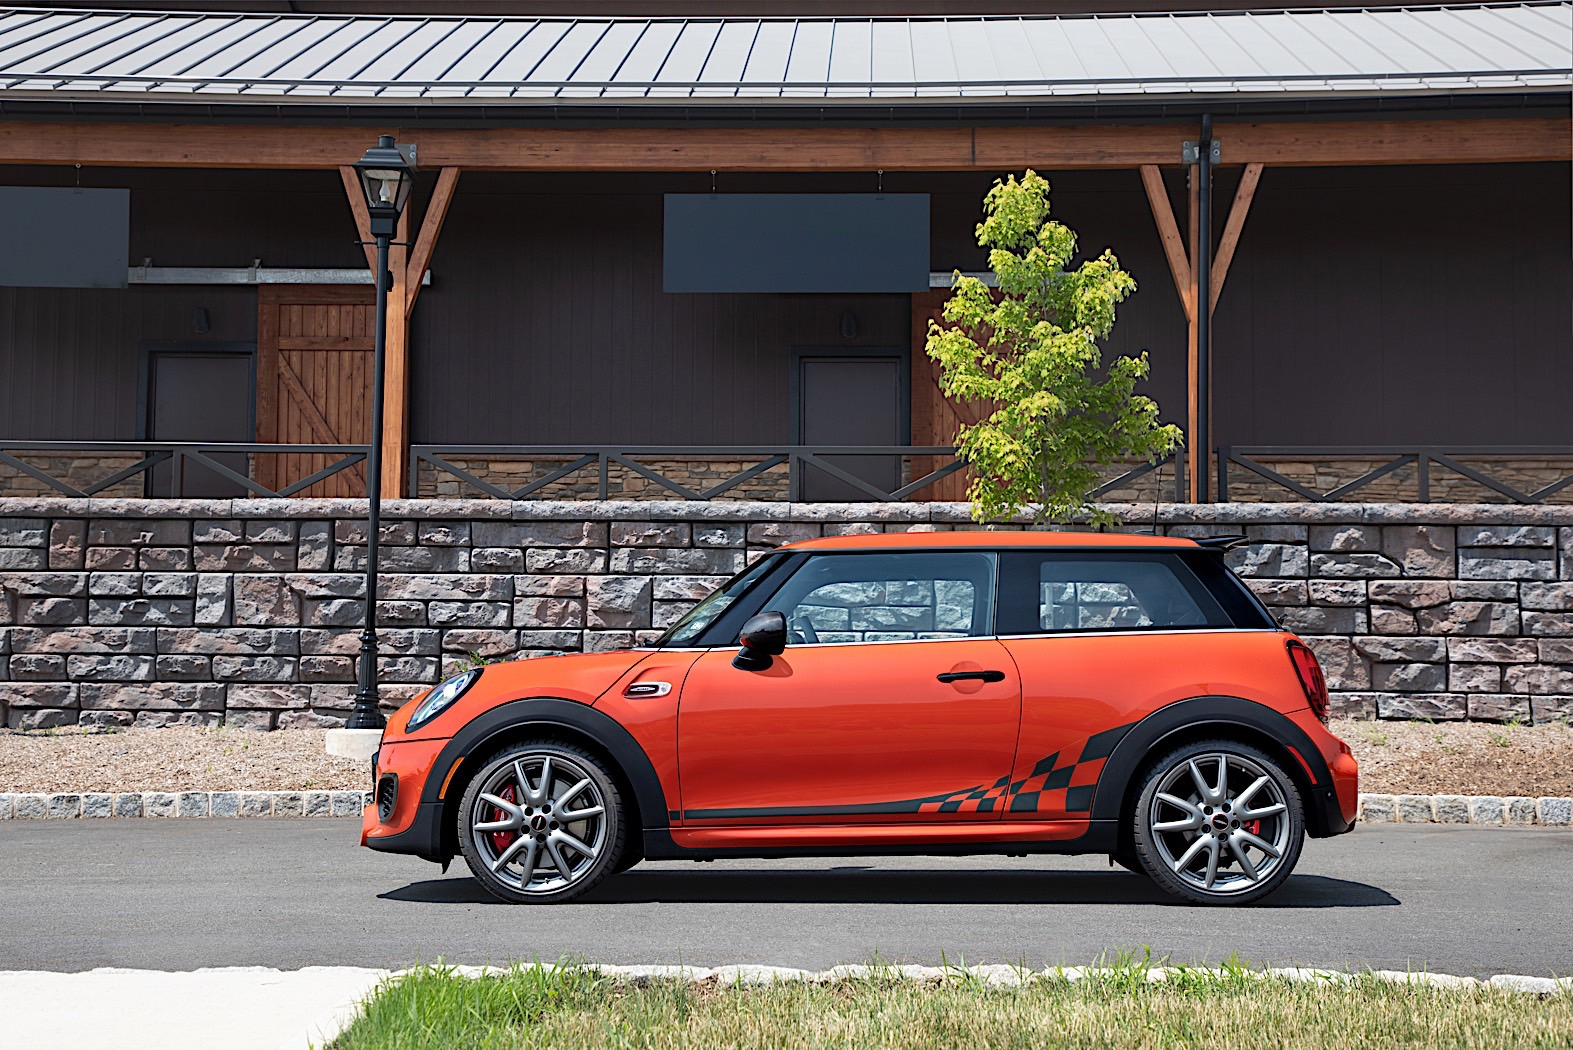 Mini Takes The States With New Jcw International Orange Edition